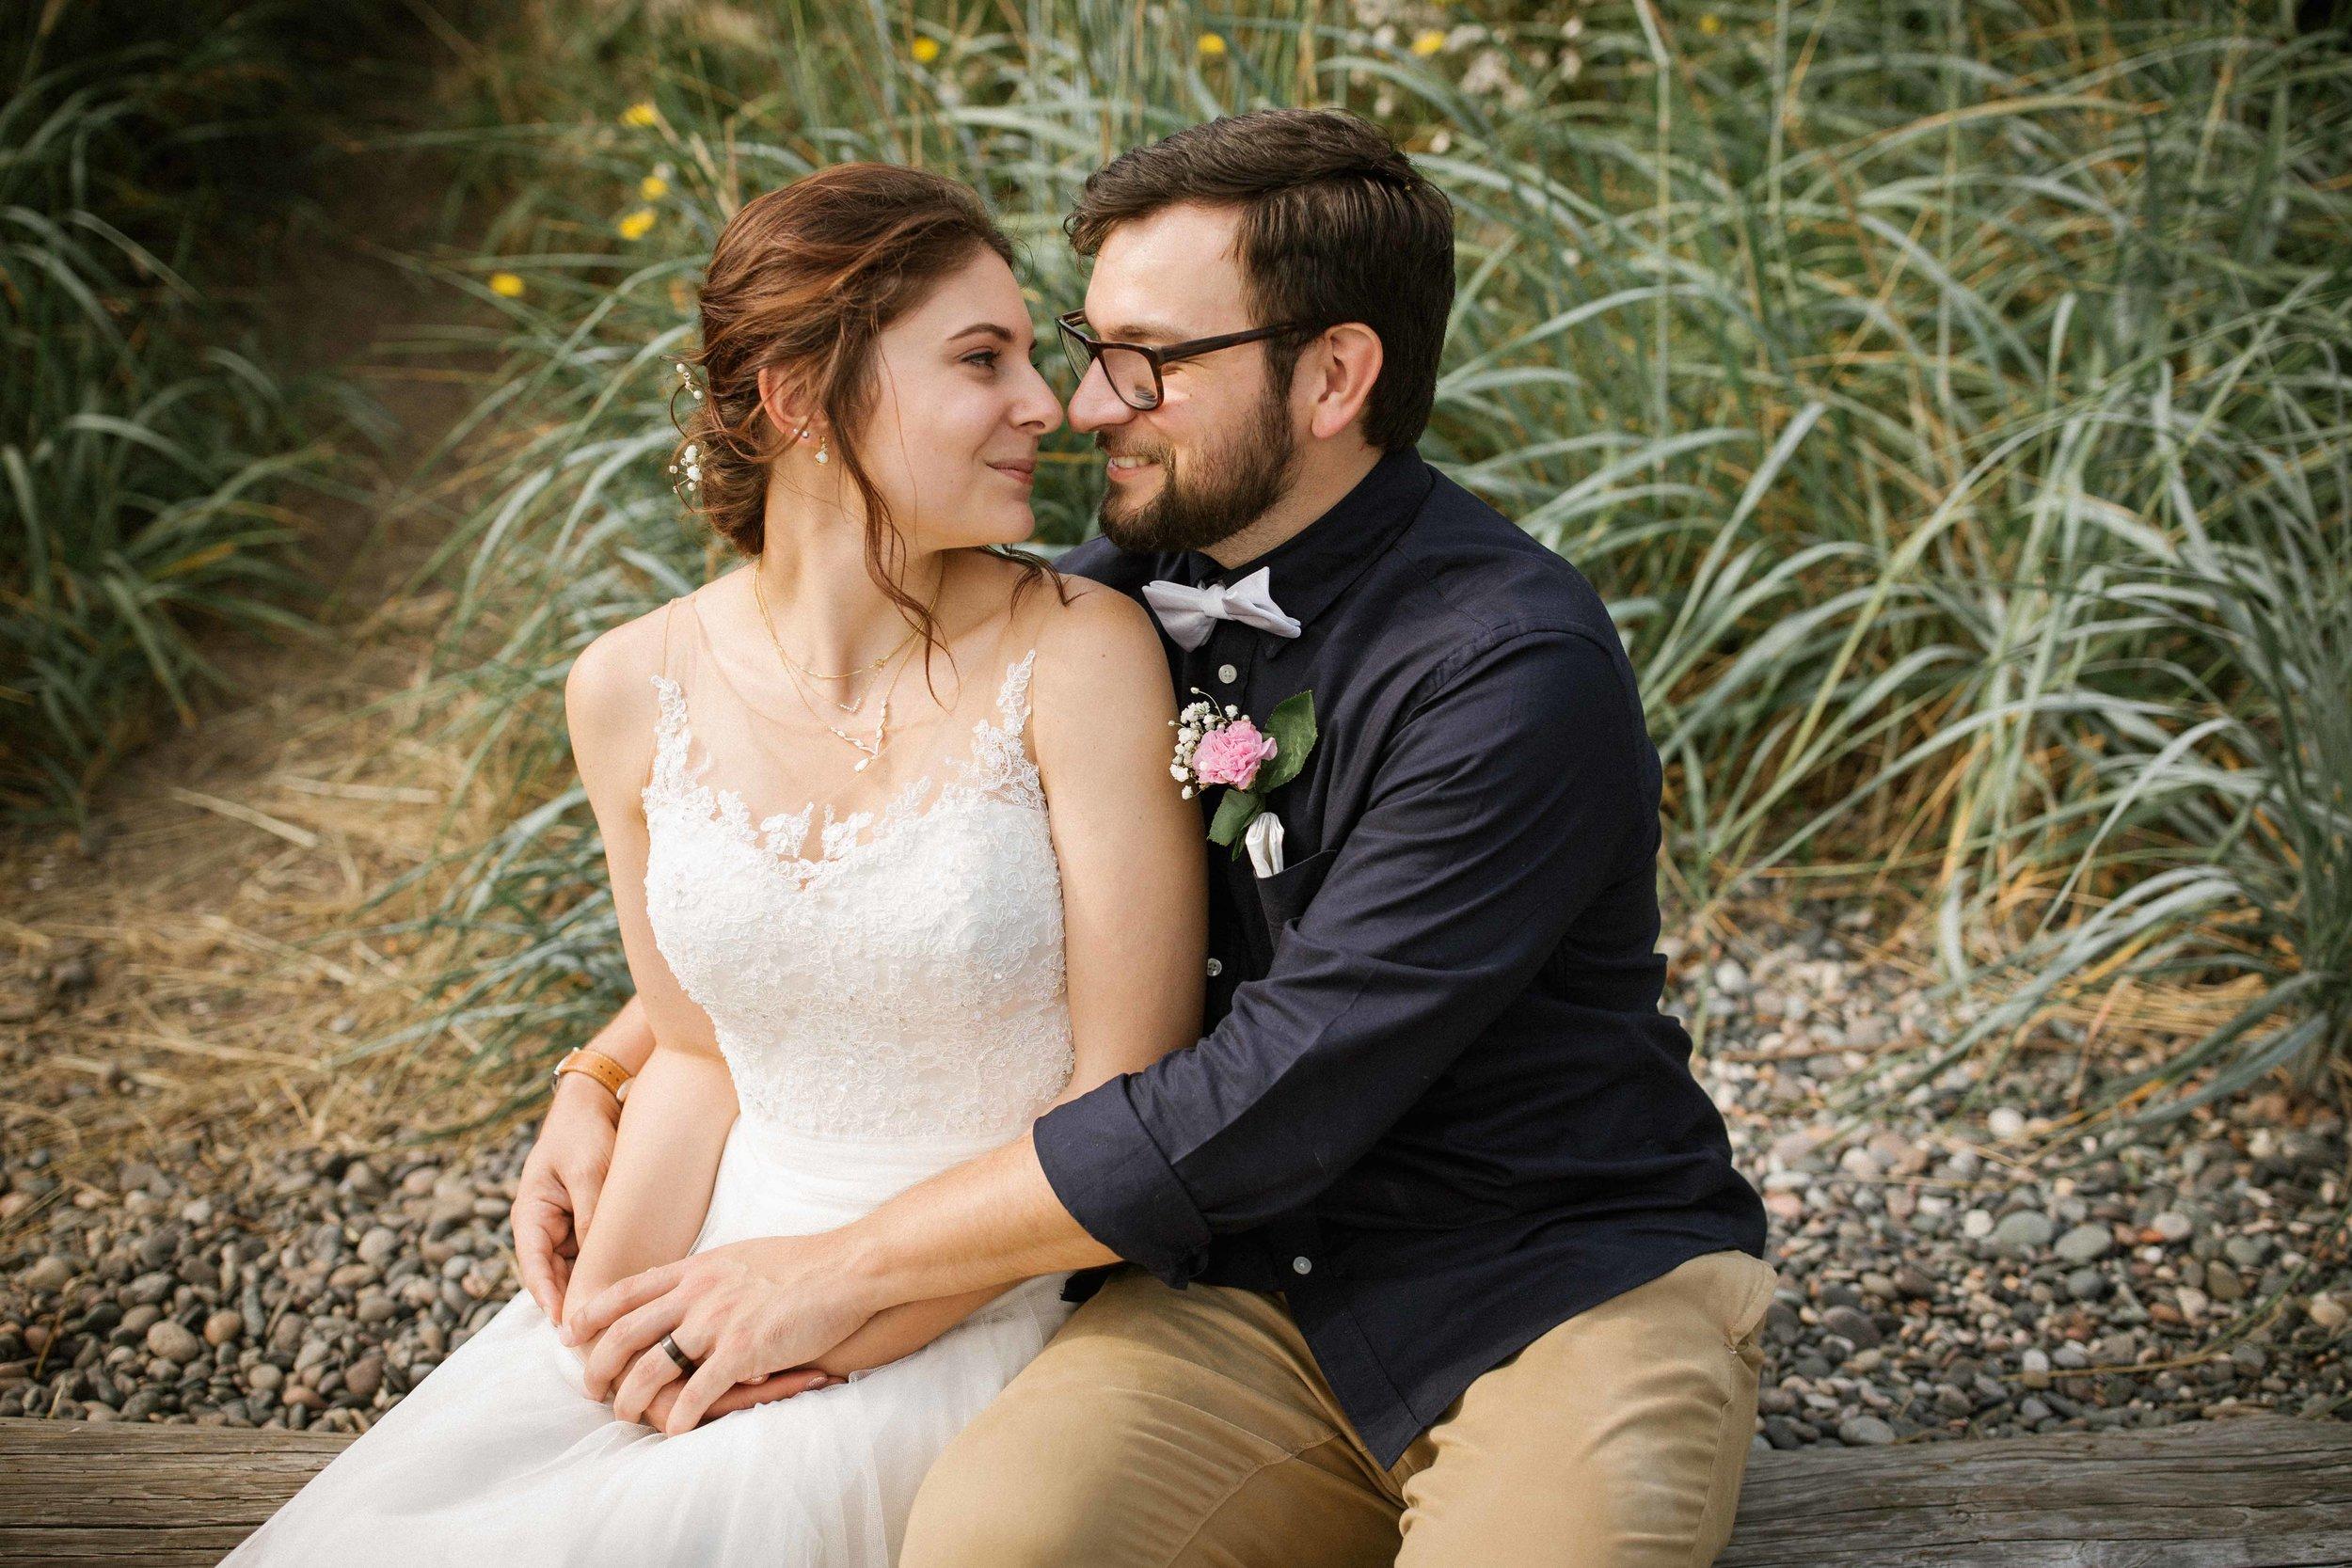 deception-pass-wedding-58.jpg